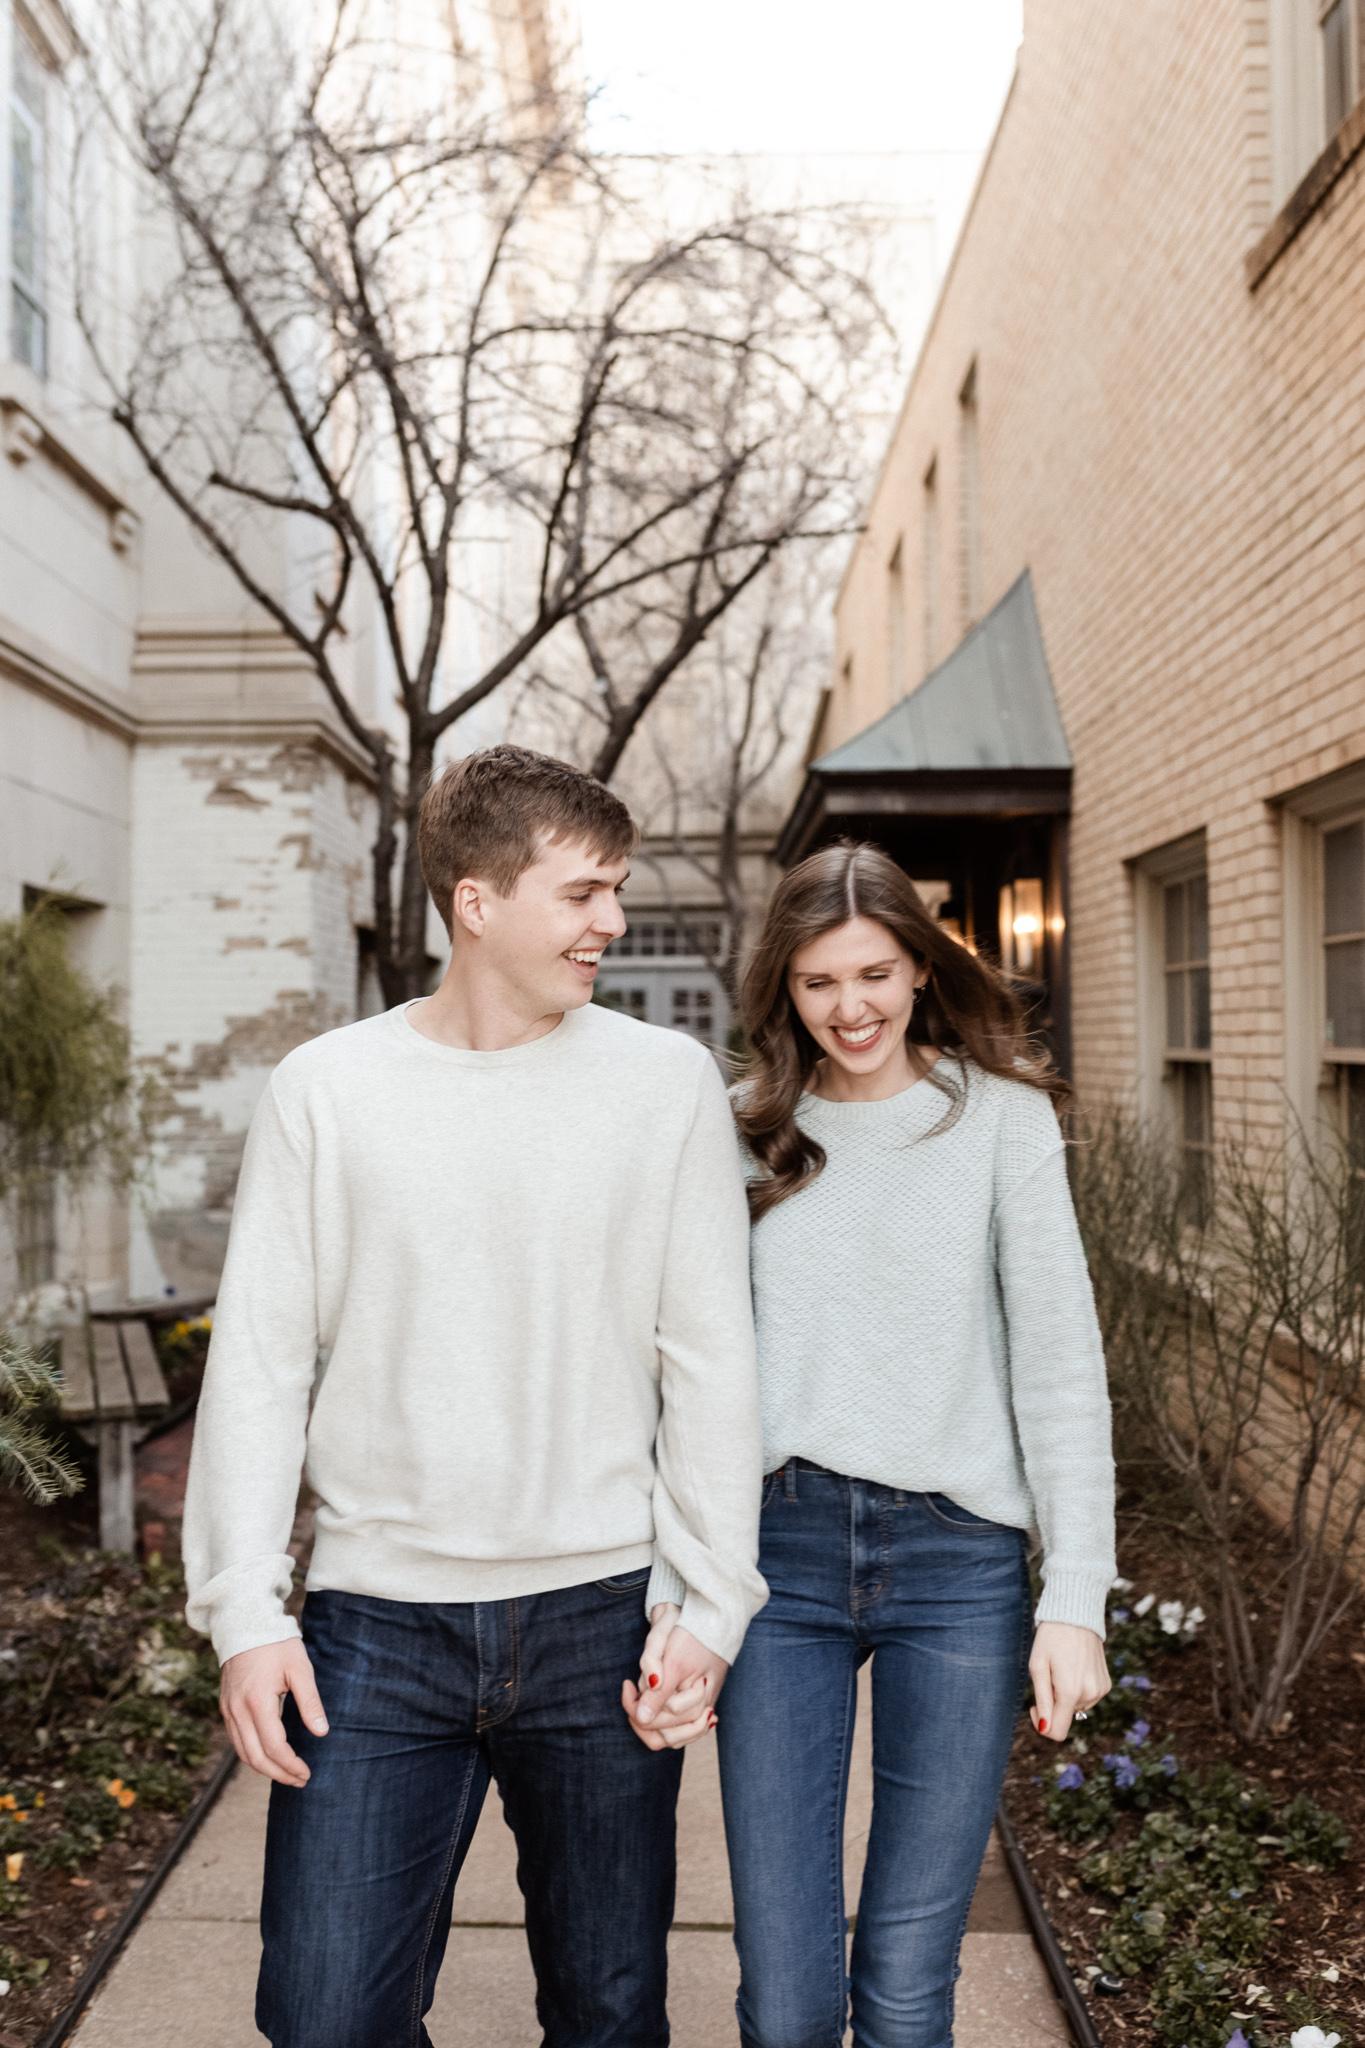 Browne | Timeless Downtown Engagements | Oklahoma Wedding Photographer-34.jpg